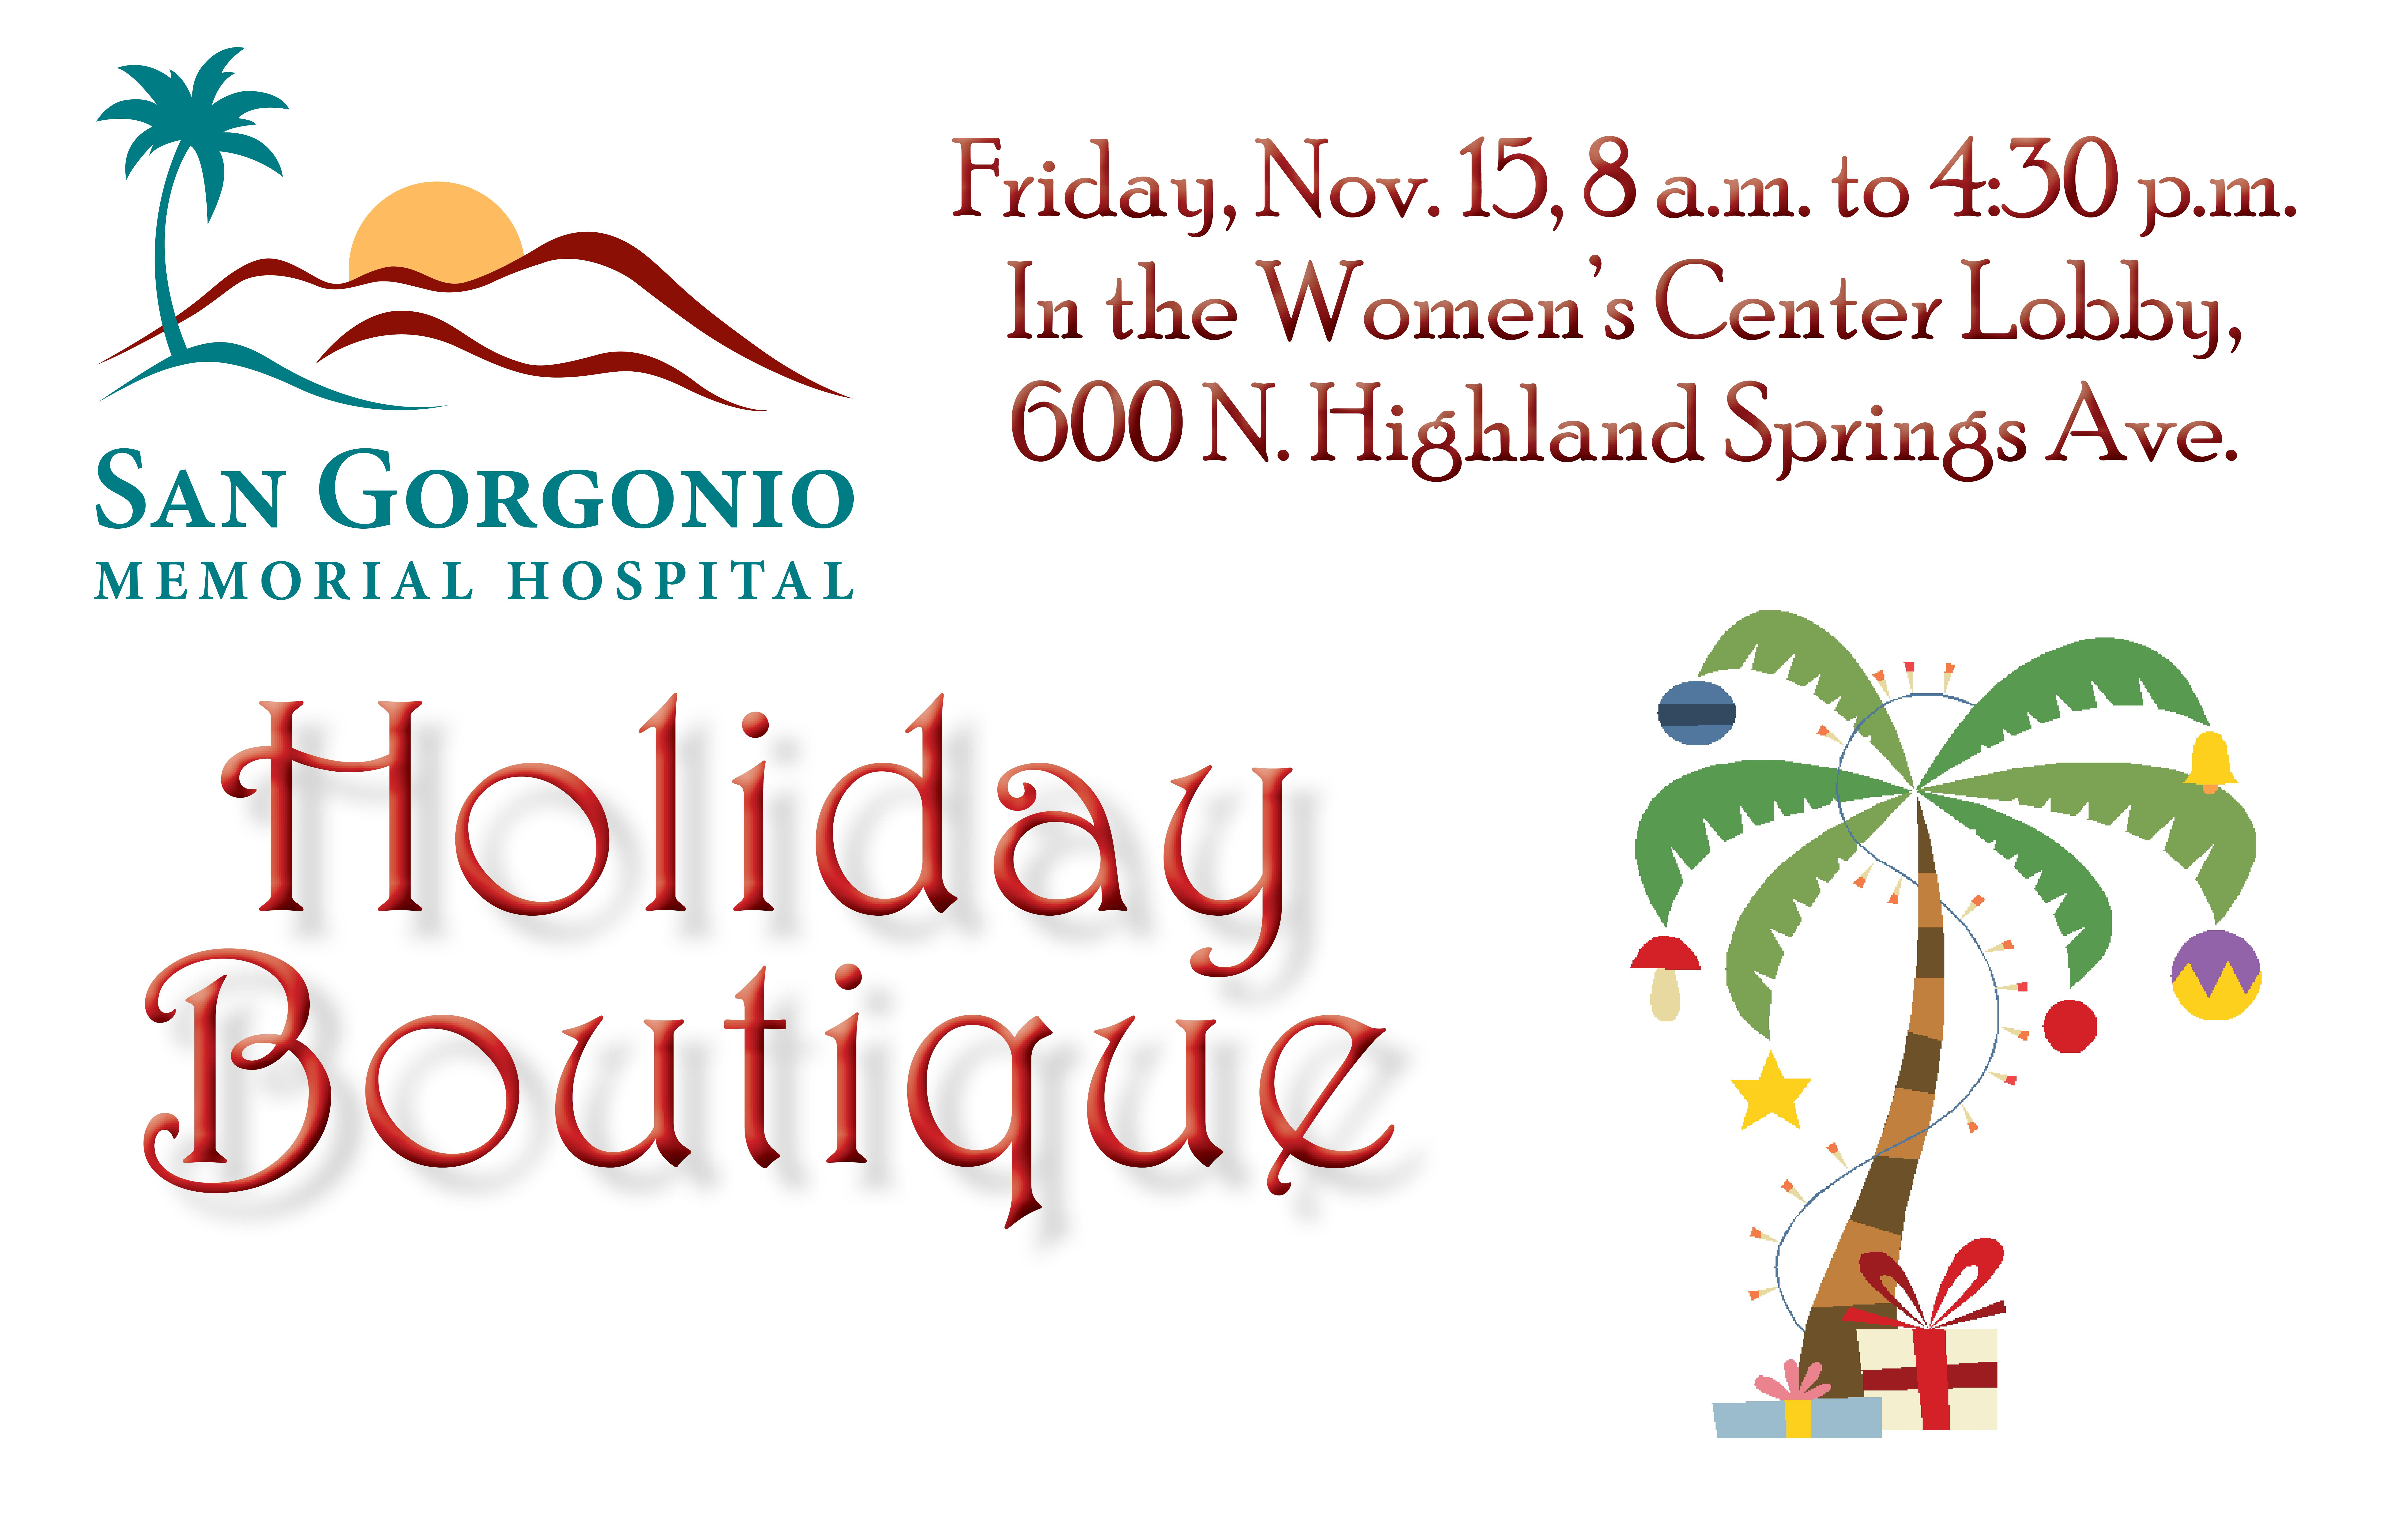 San Gorgonio Memorial Hospital Holiday Boutique Planned